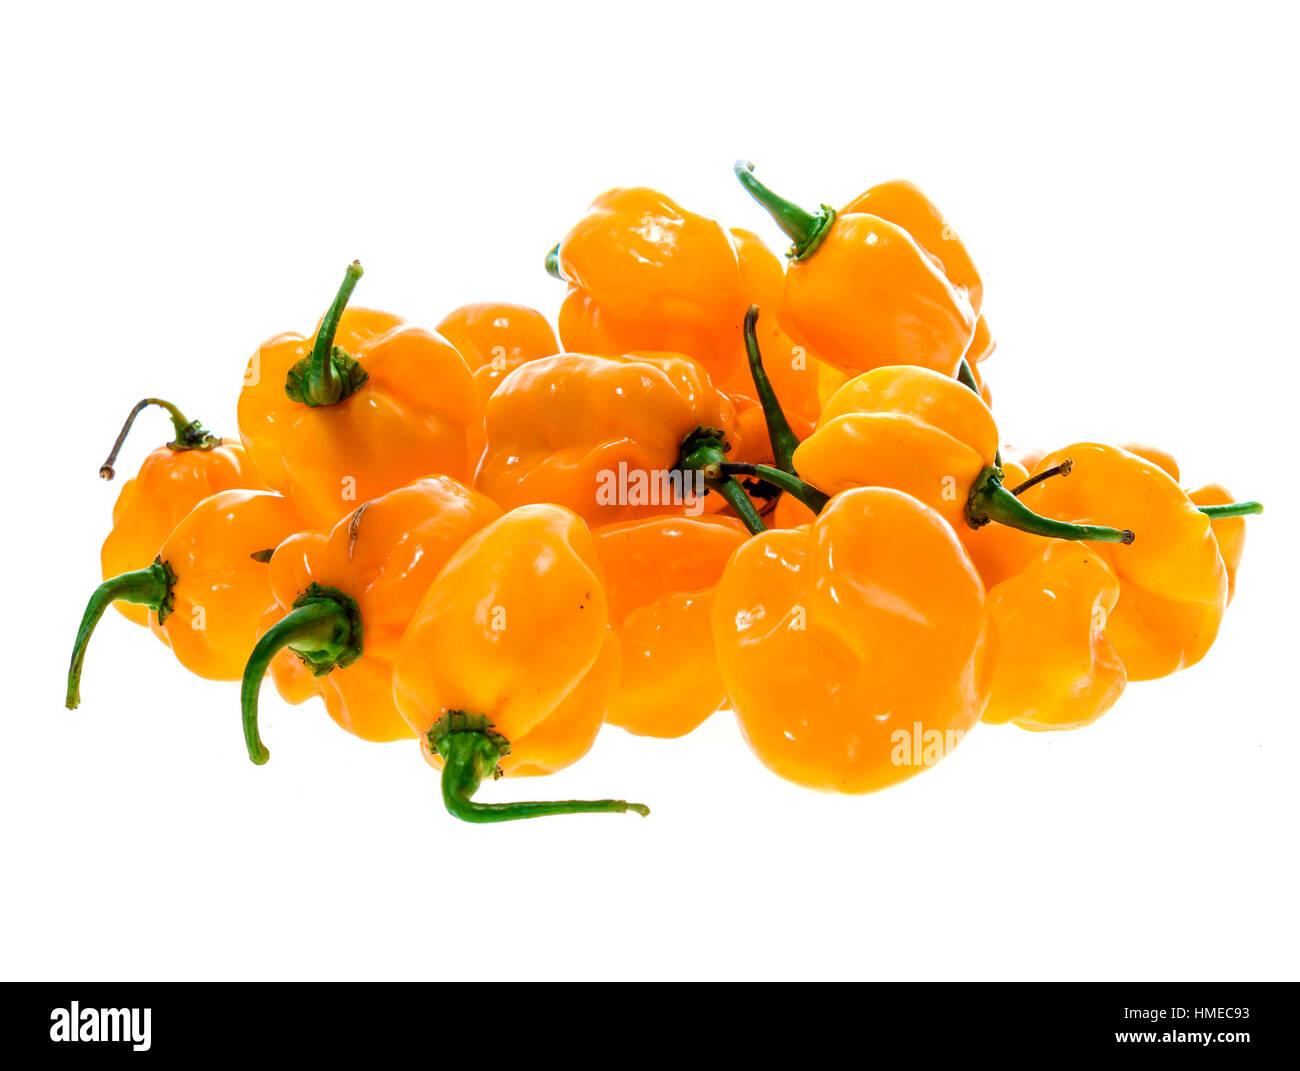 Bunch of Yellow orange ripe habanero hot chili peppers. Isolated on white. Stock Photo